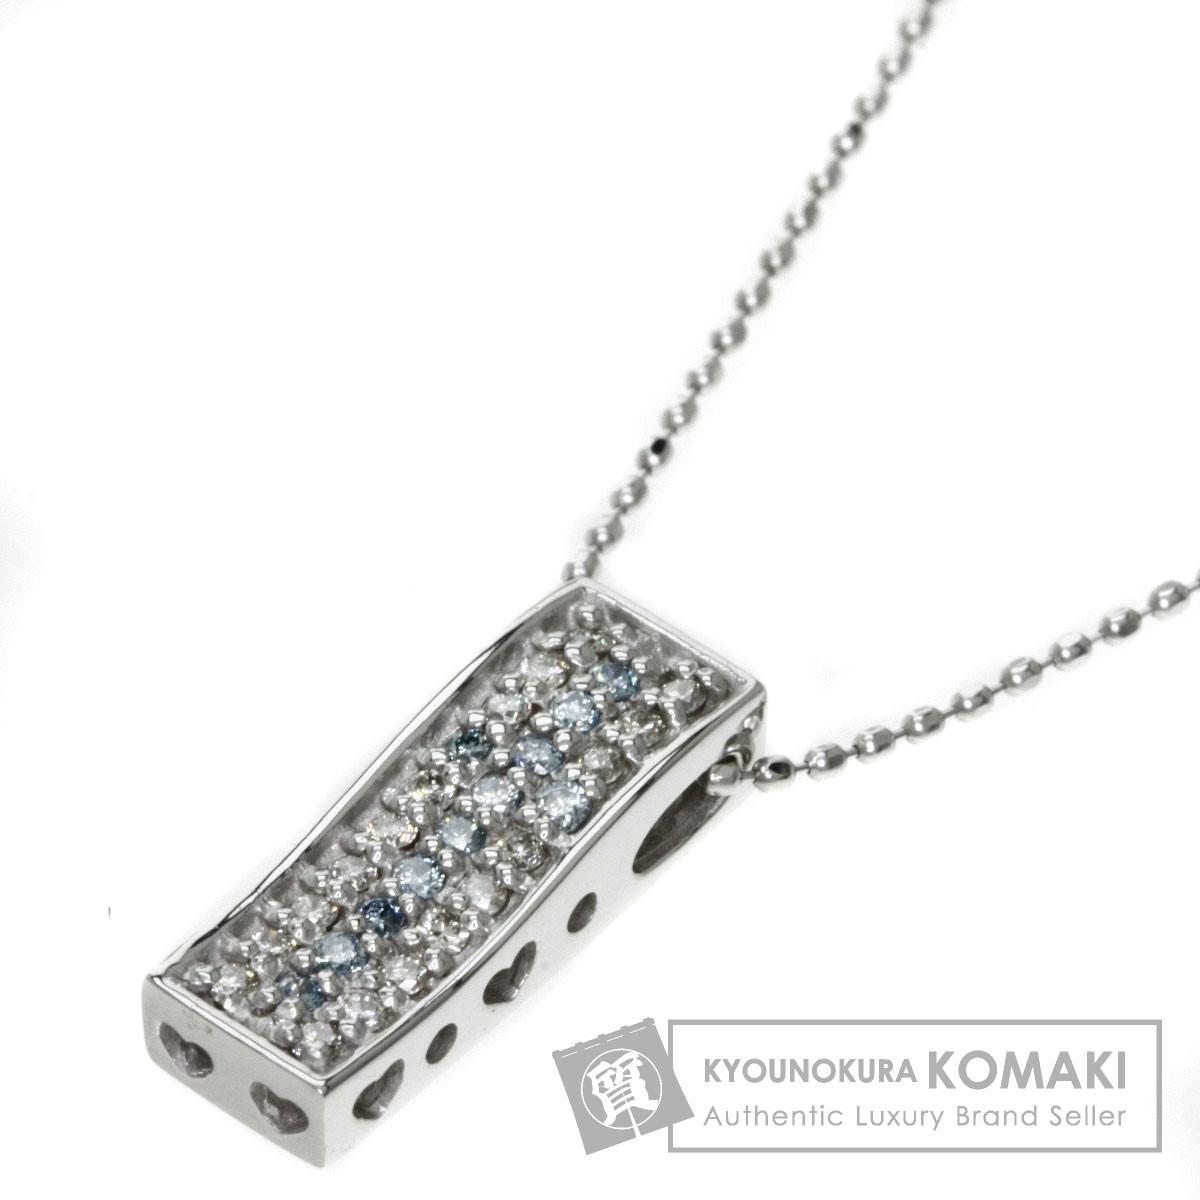 0.2ct ダイヤモンド ネックレス K18ホワイトゴールド 3.37g レディース 【中古】